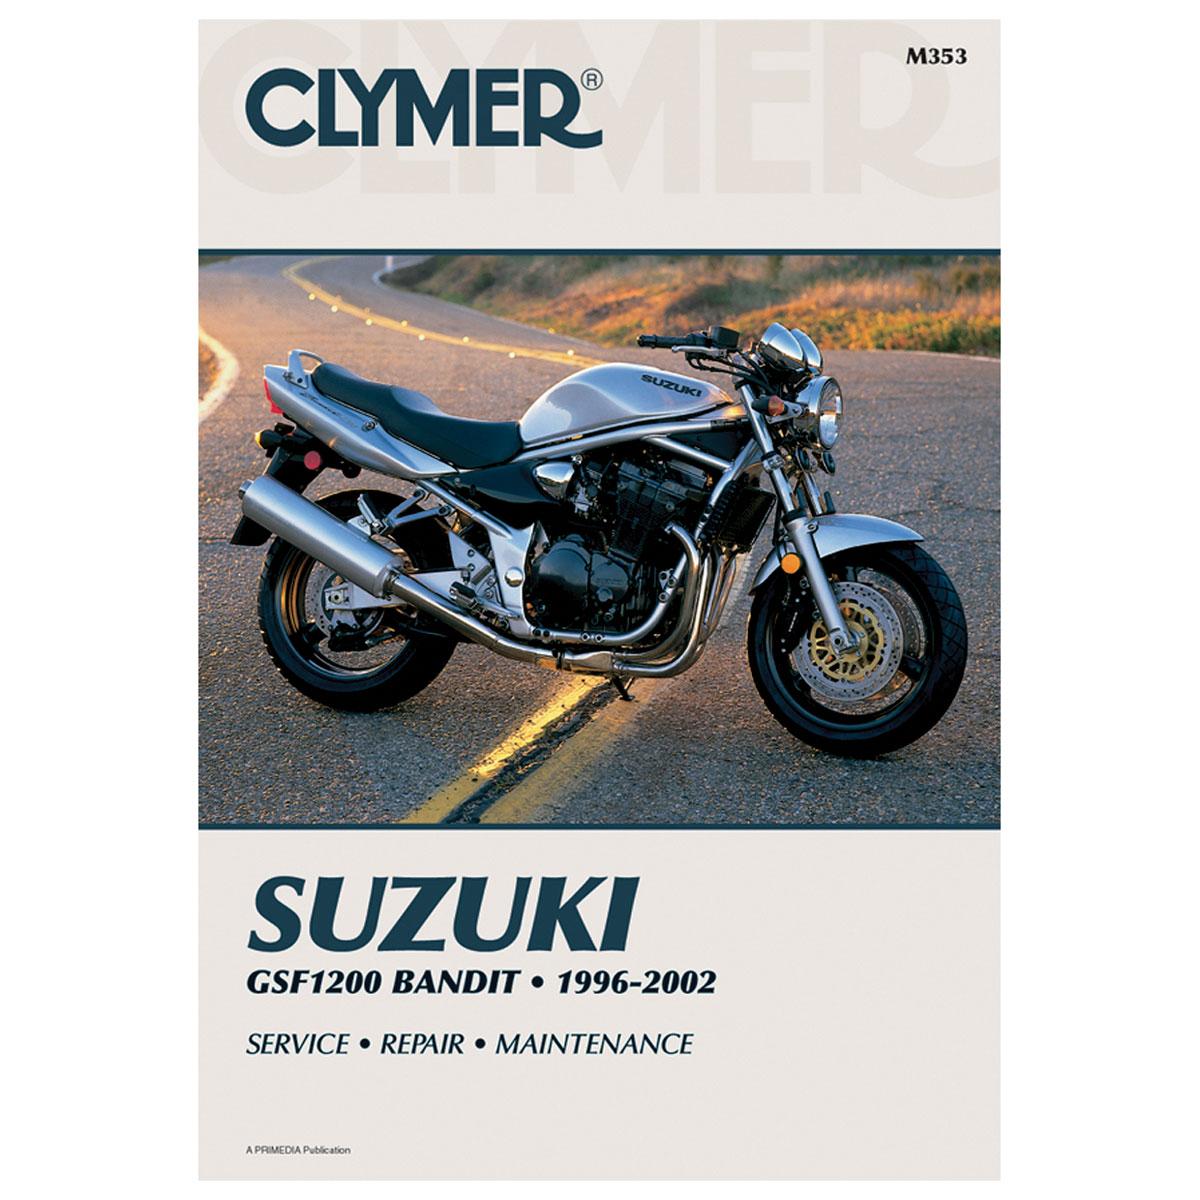 Clymer Suzuki Motorcycle Repair Manual - M353